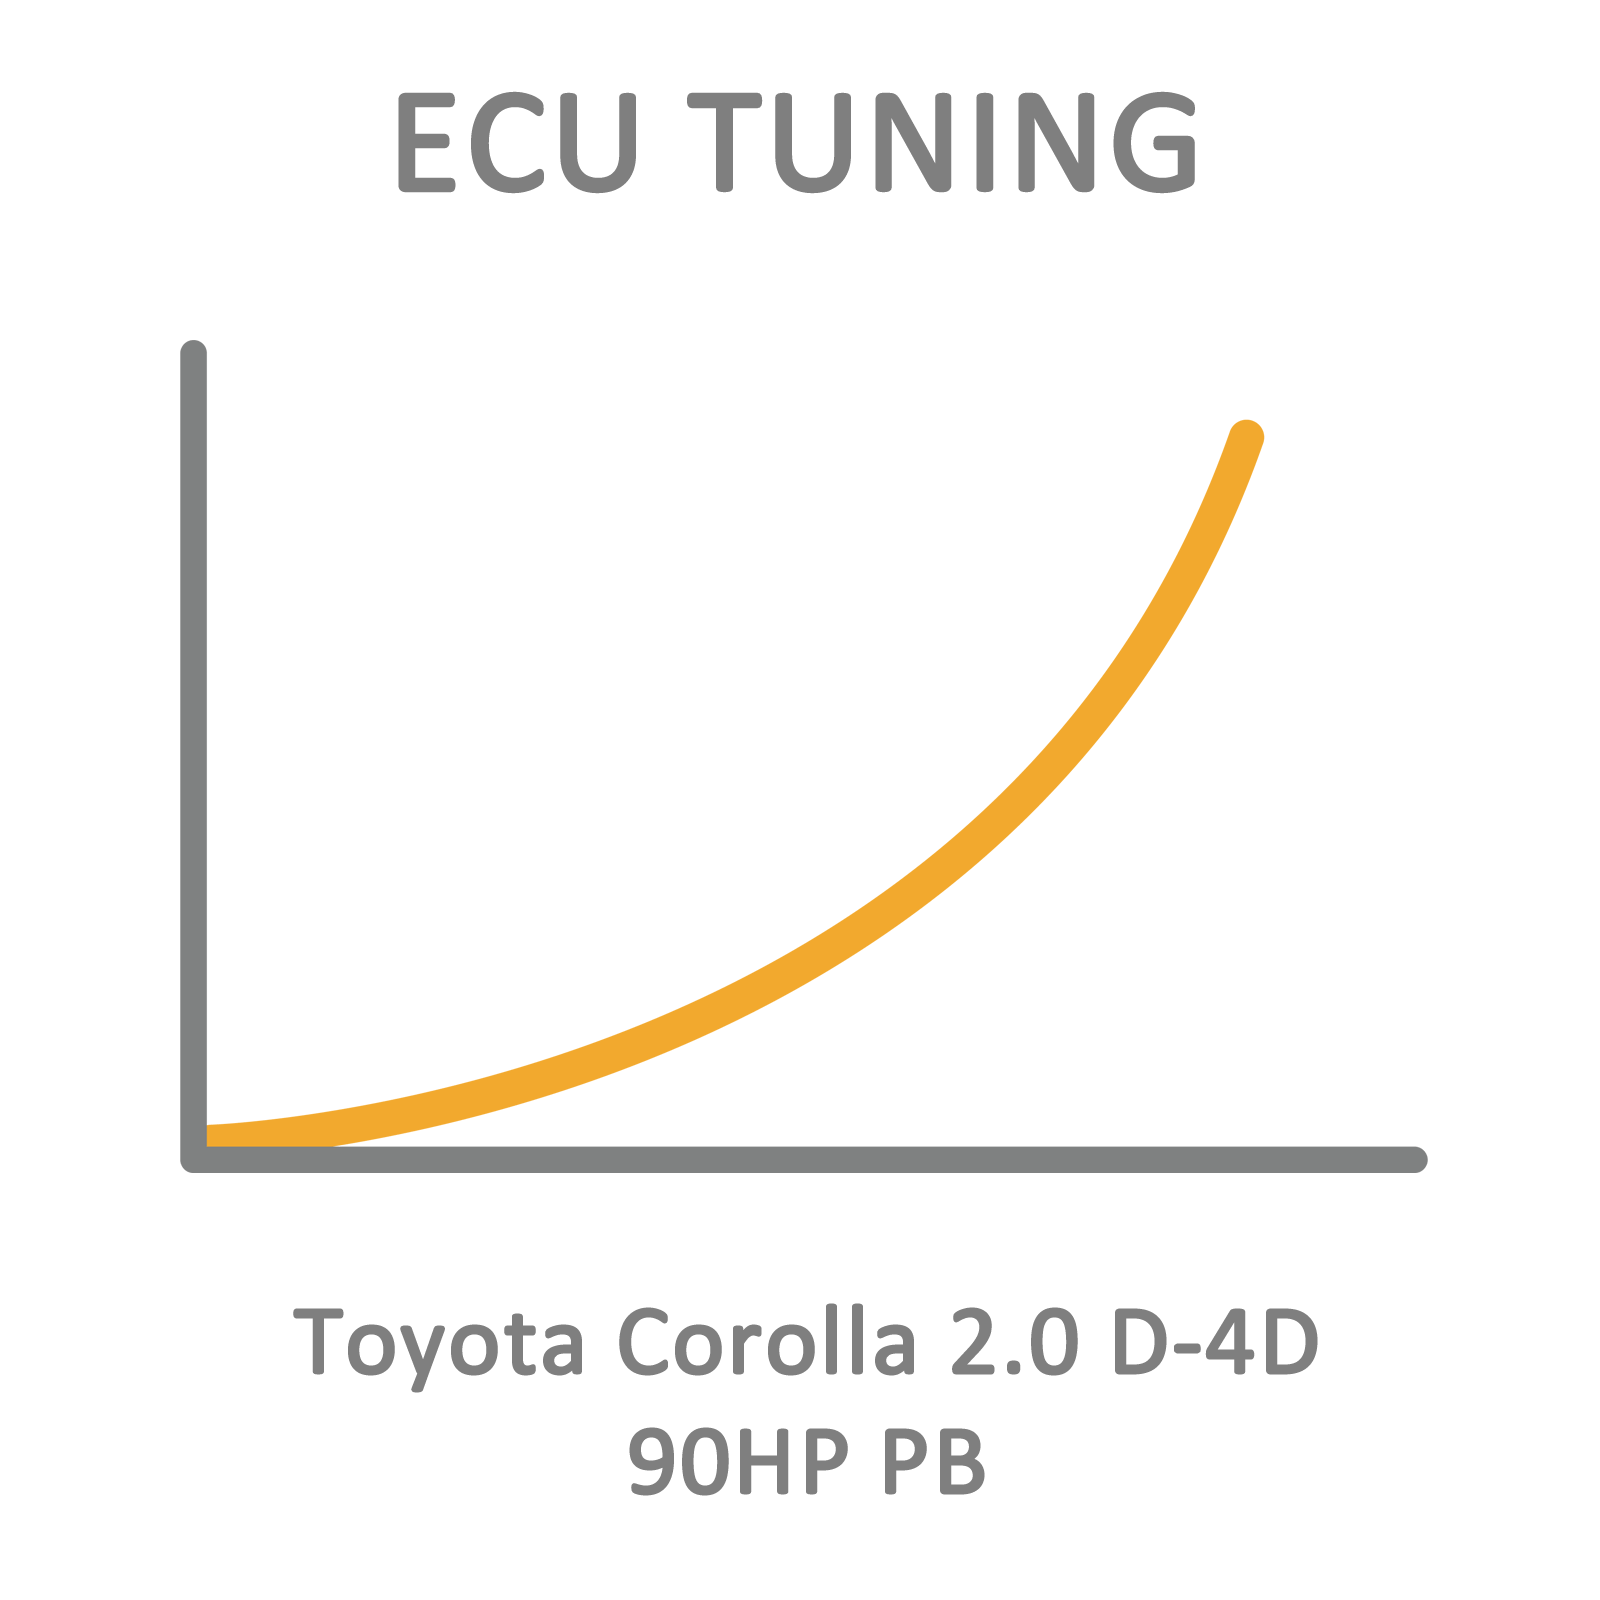 Toyota Corolla 2.0 D-4D 90HP PB ECU Tuning Remapping